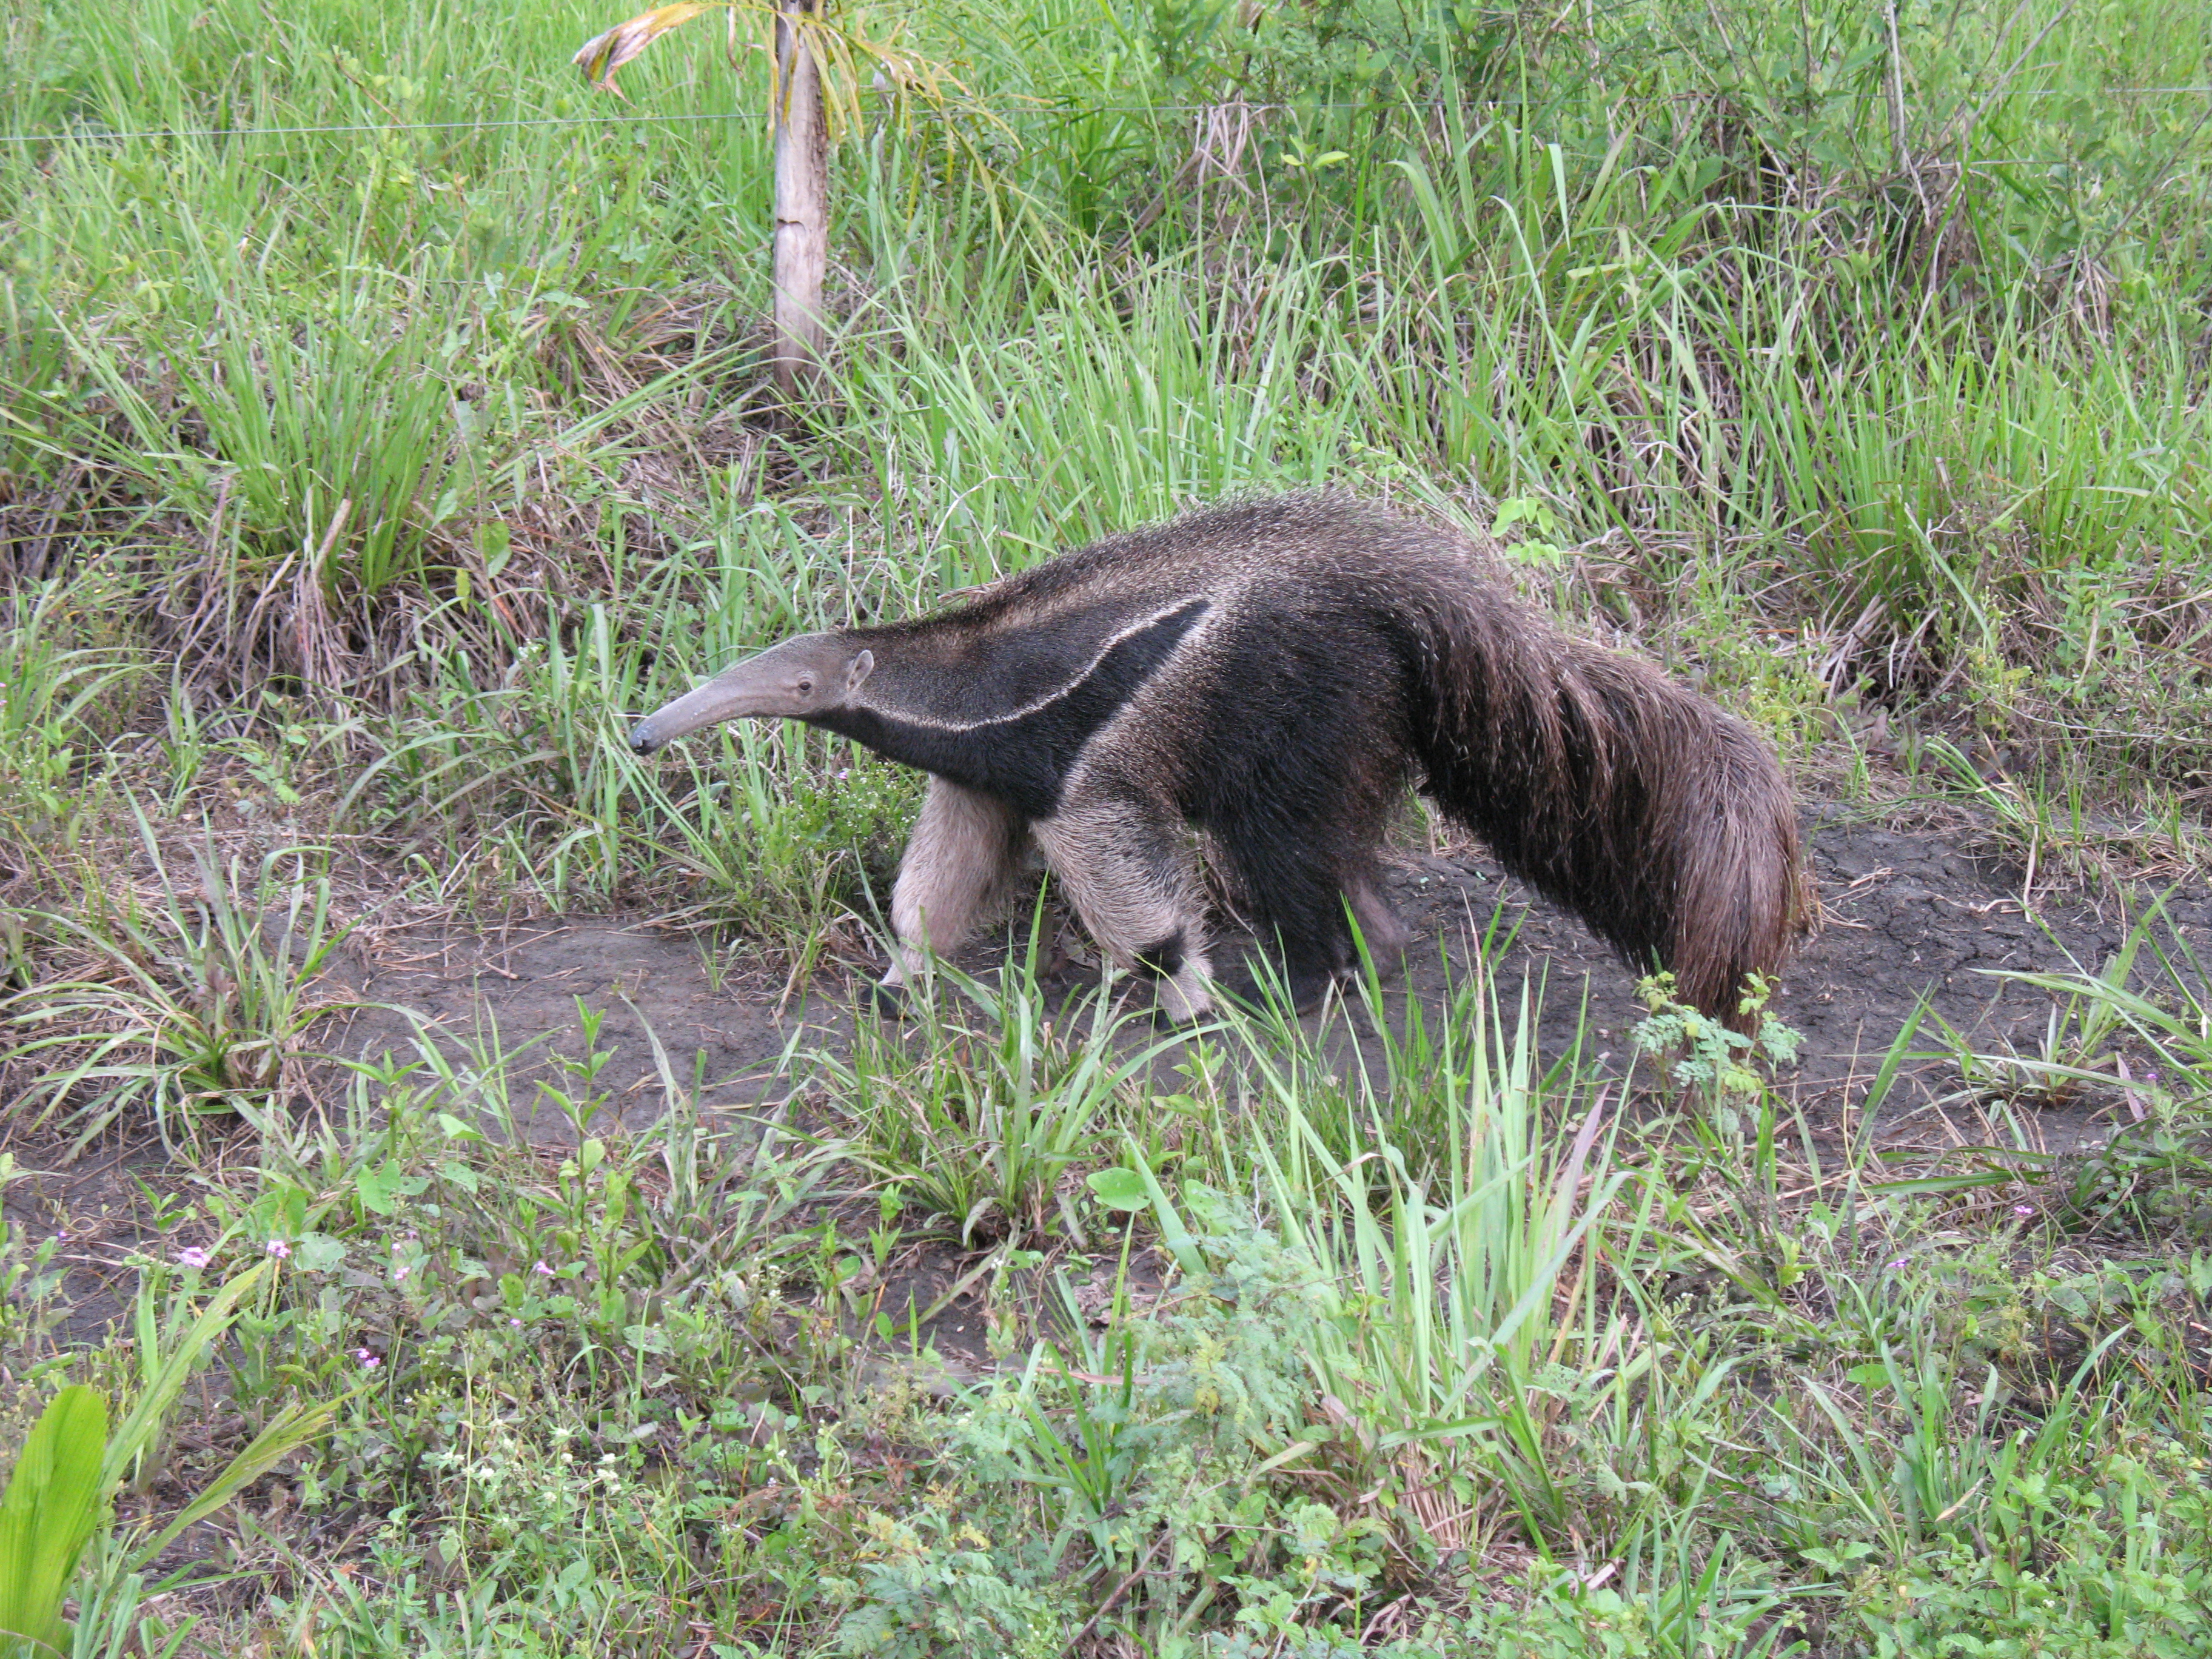 Ficheiro:Myrmecophaga tridactyla, Pantanal region, Brazil ... Ragnarok Online 2 Anteater